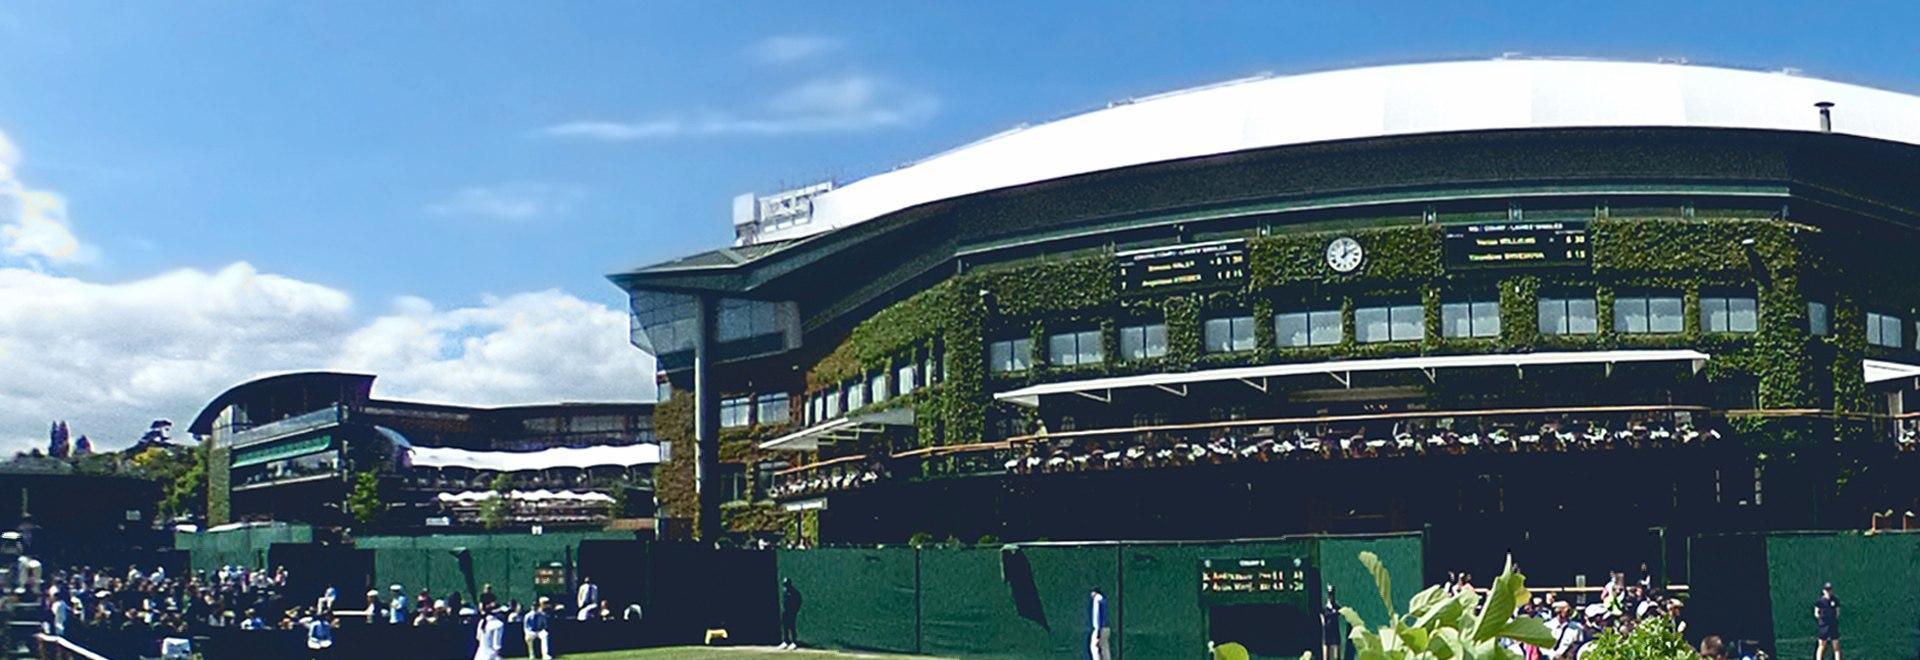 Wimbledon: Clijsters - Farina 2003. Quarti F